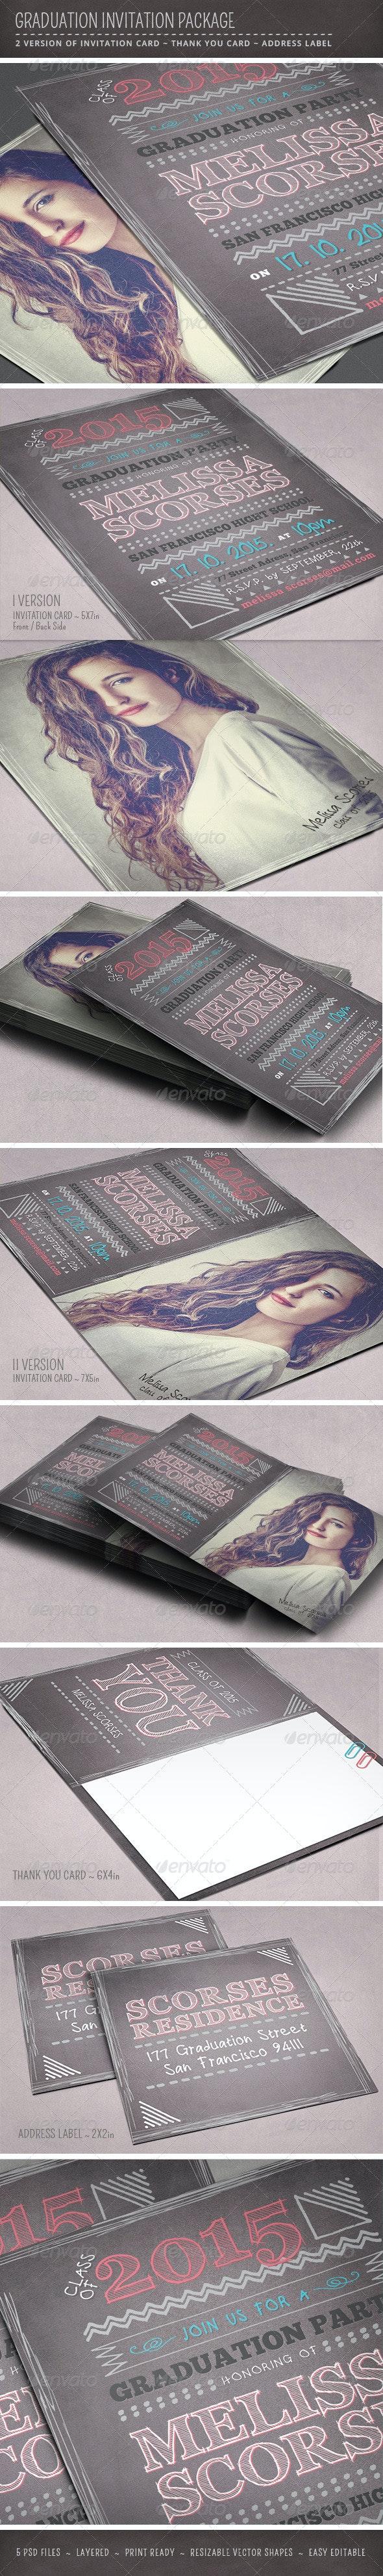 Graduation Invitation Package - Invitations Cards & Invites